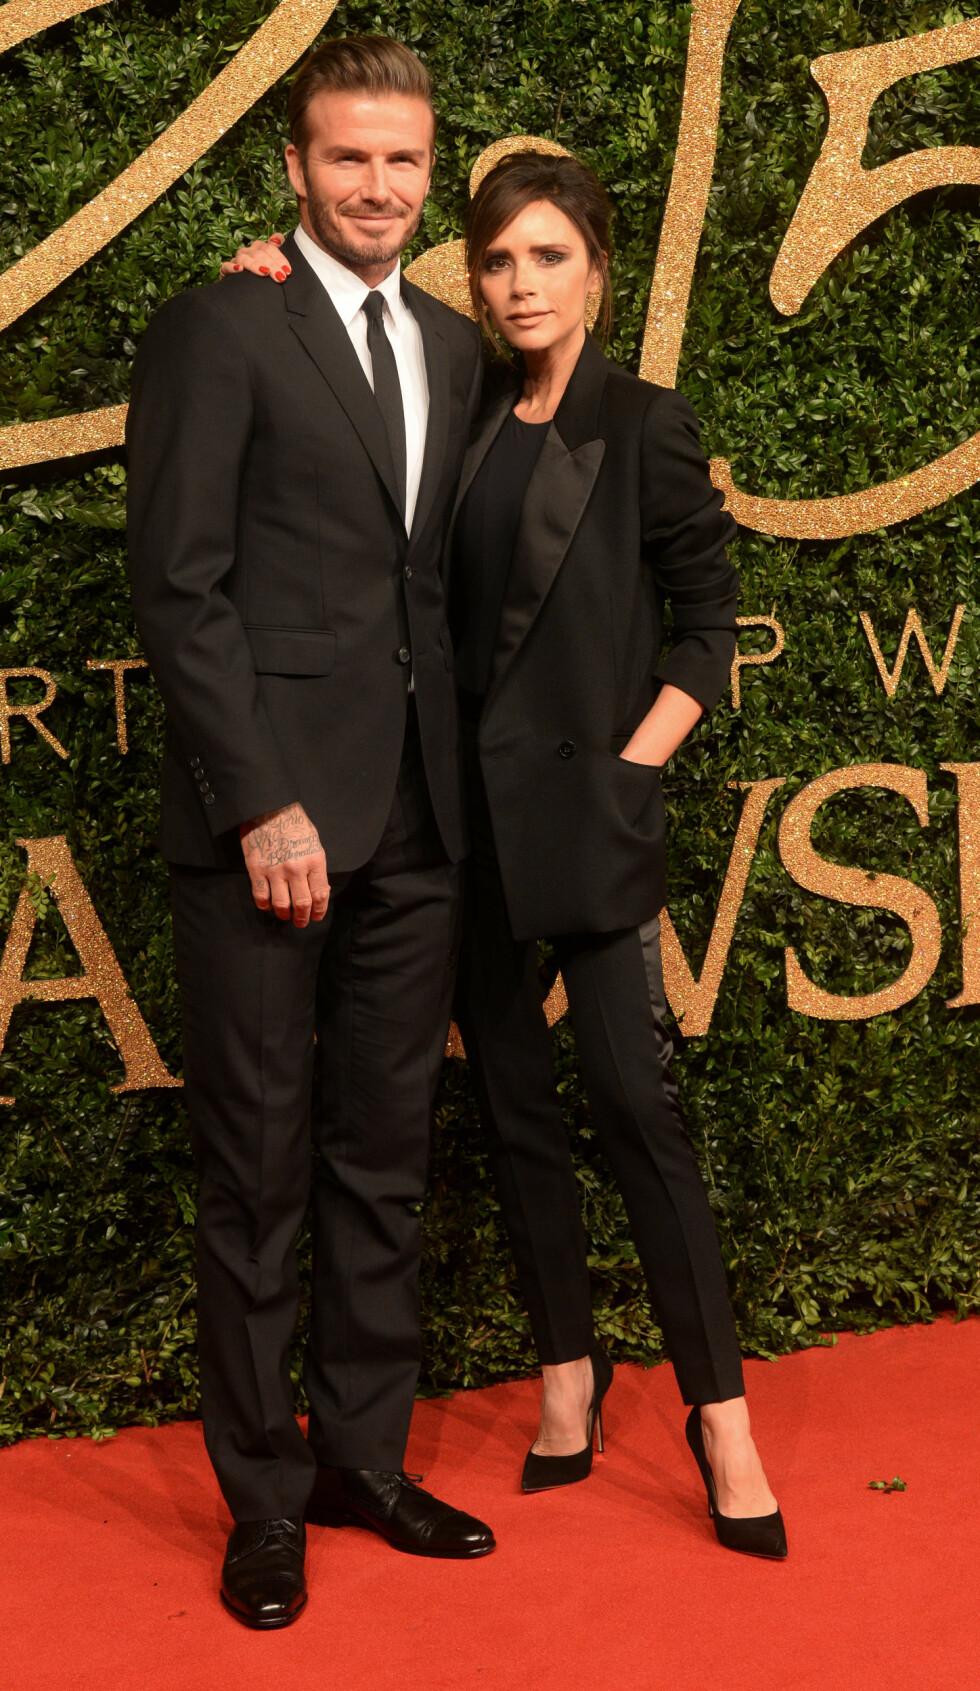 FLOTT STJERNEPAR: David Beckham og Victoria Beckham ser alltid strålende ut sammen. Her er de i matchende antrekk under British Fashion Awards i fjor.  Foto: Splash News